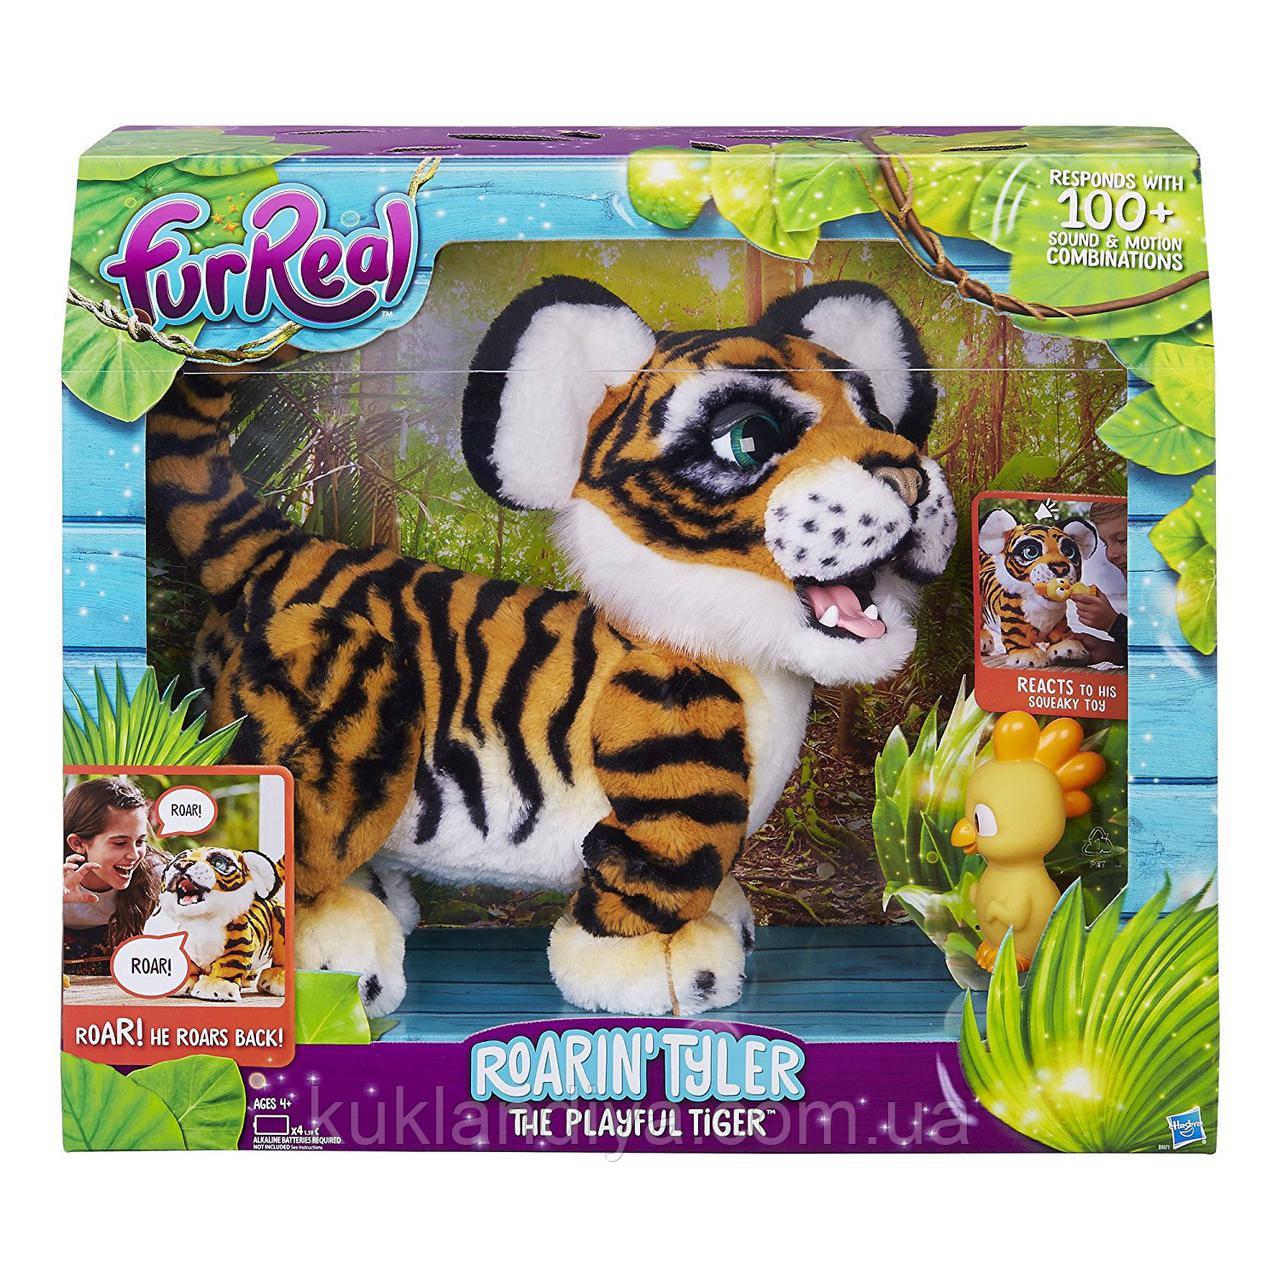 FurReal Roarin' Tyler, The Playful Tiger - Тайлер Интерактивный Тигрёнок